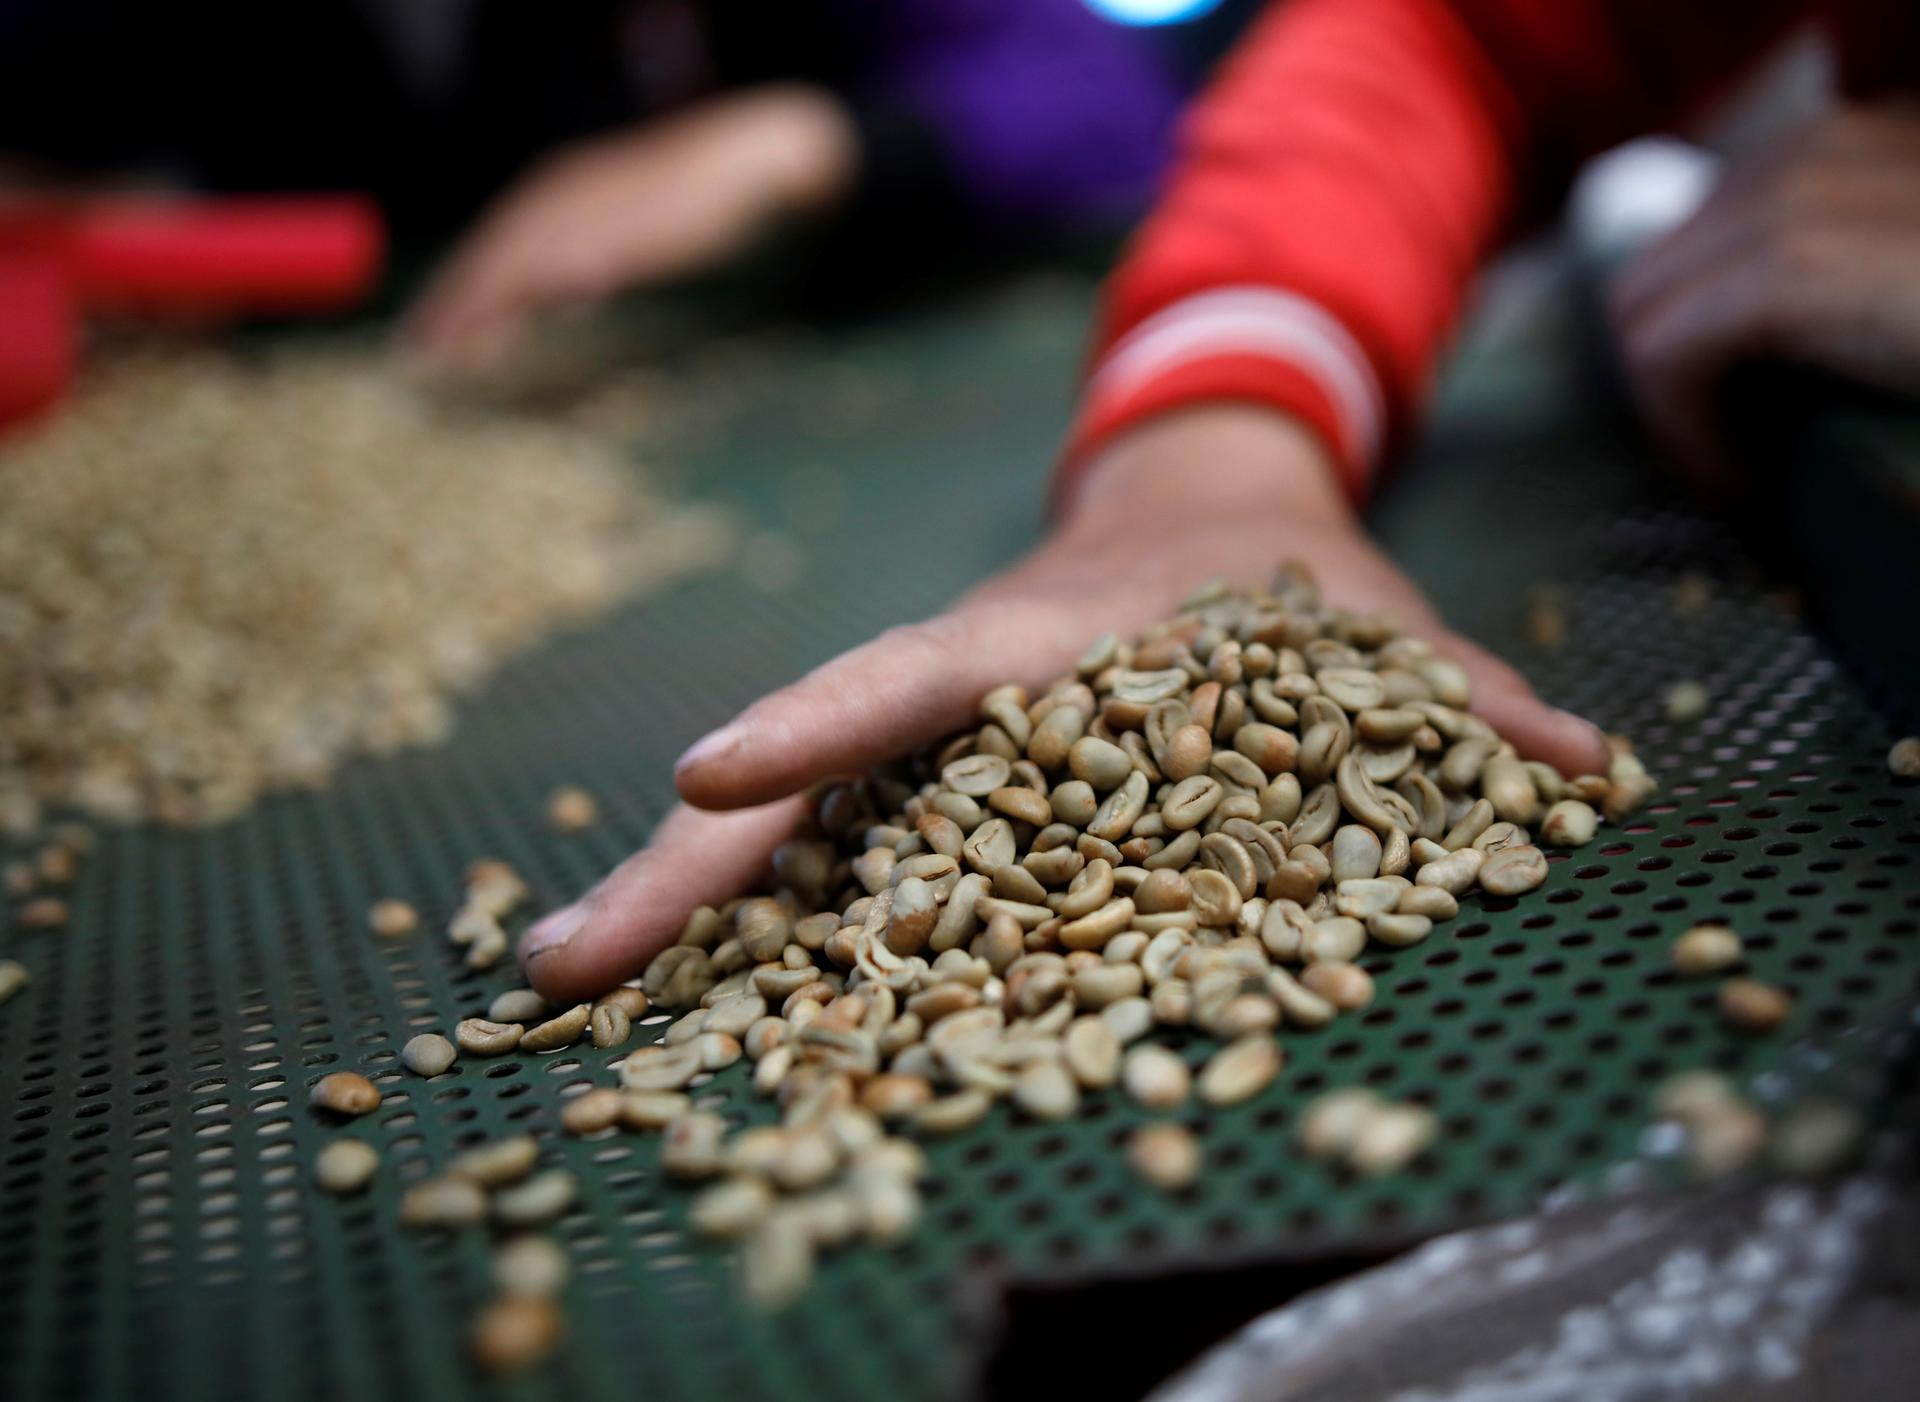 Asia Coffee-Vietnam stocks low; trade picks up in Indonesia